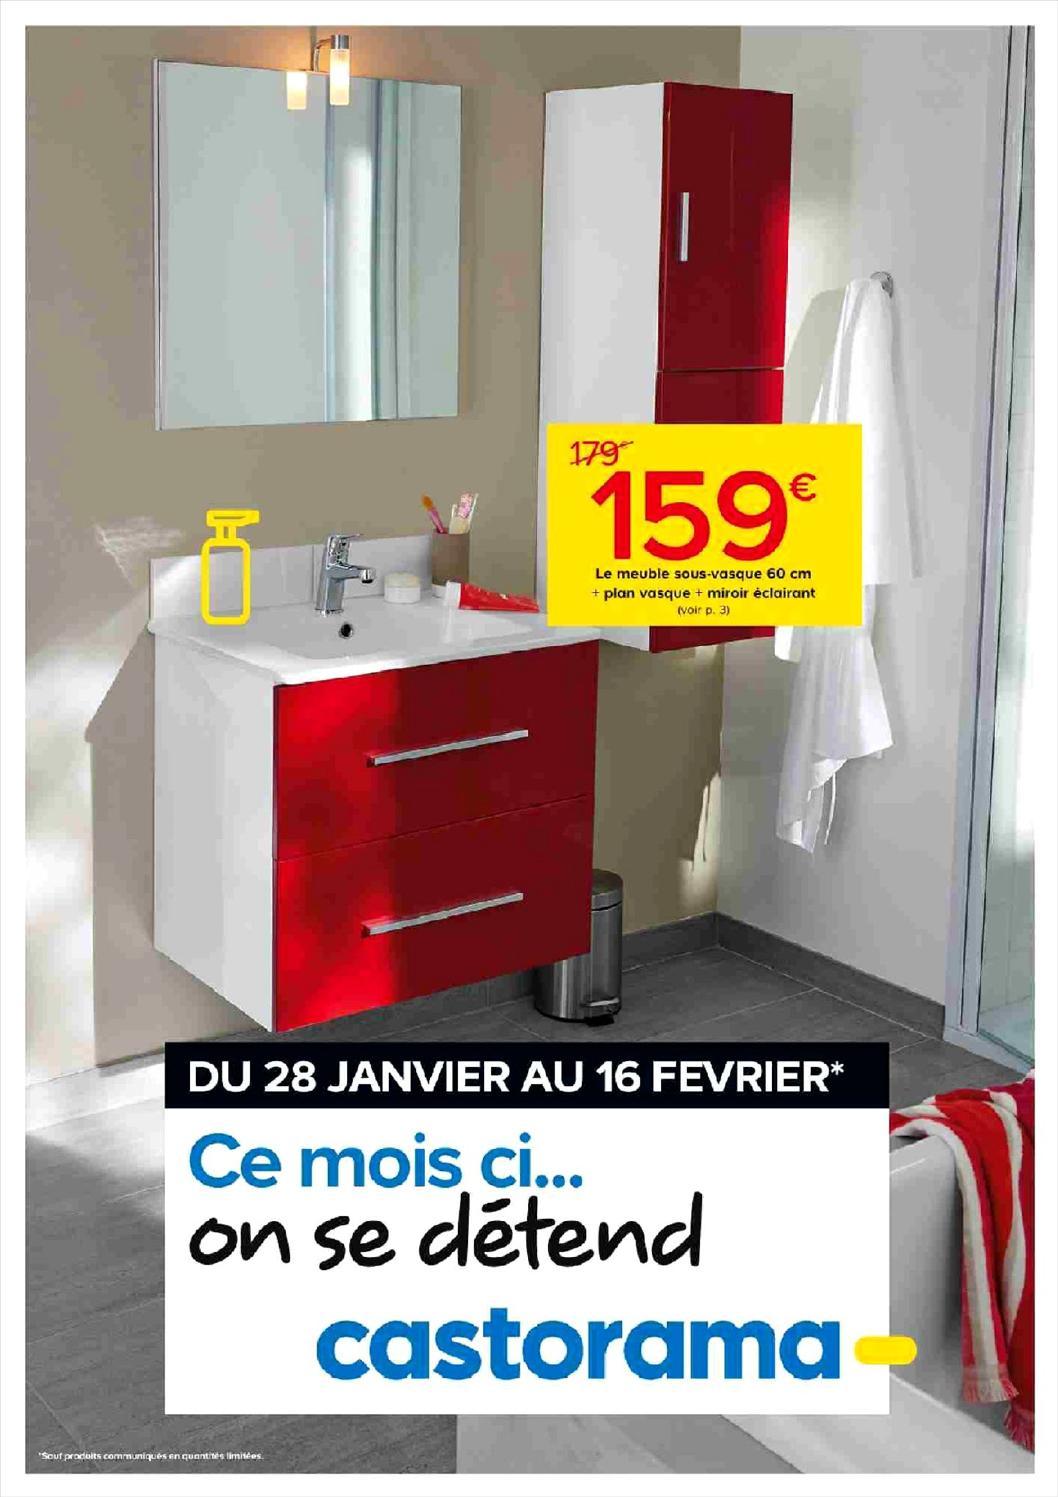 castorama valabledu30012015au16022015 by jan deo issuu. Black Bedroom Furniture Sets. Home Design Ideas